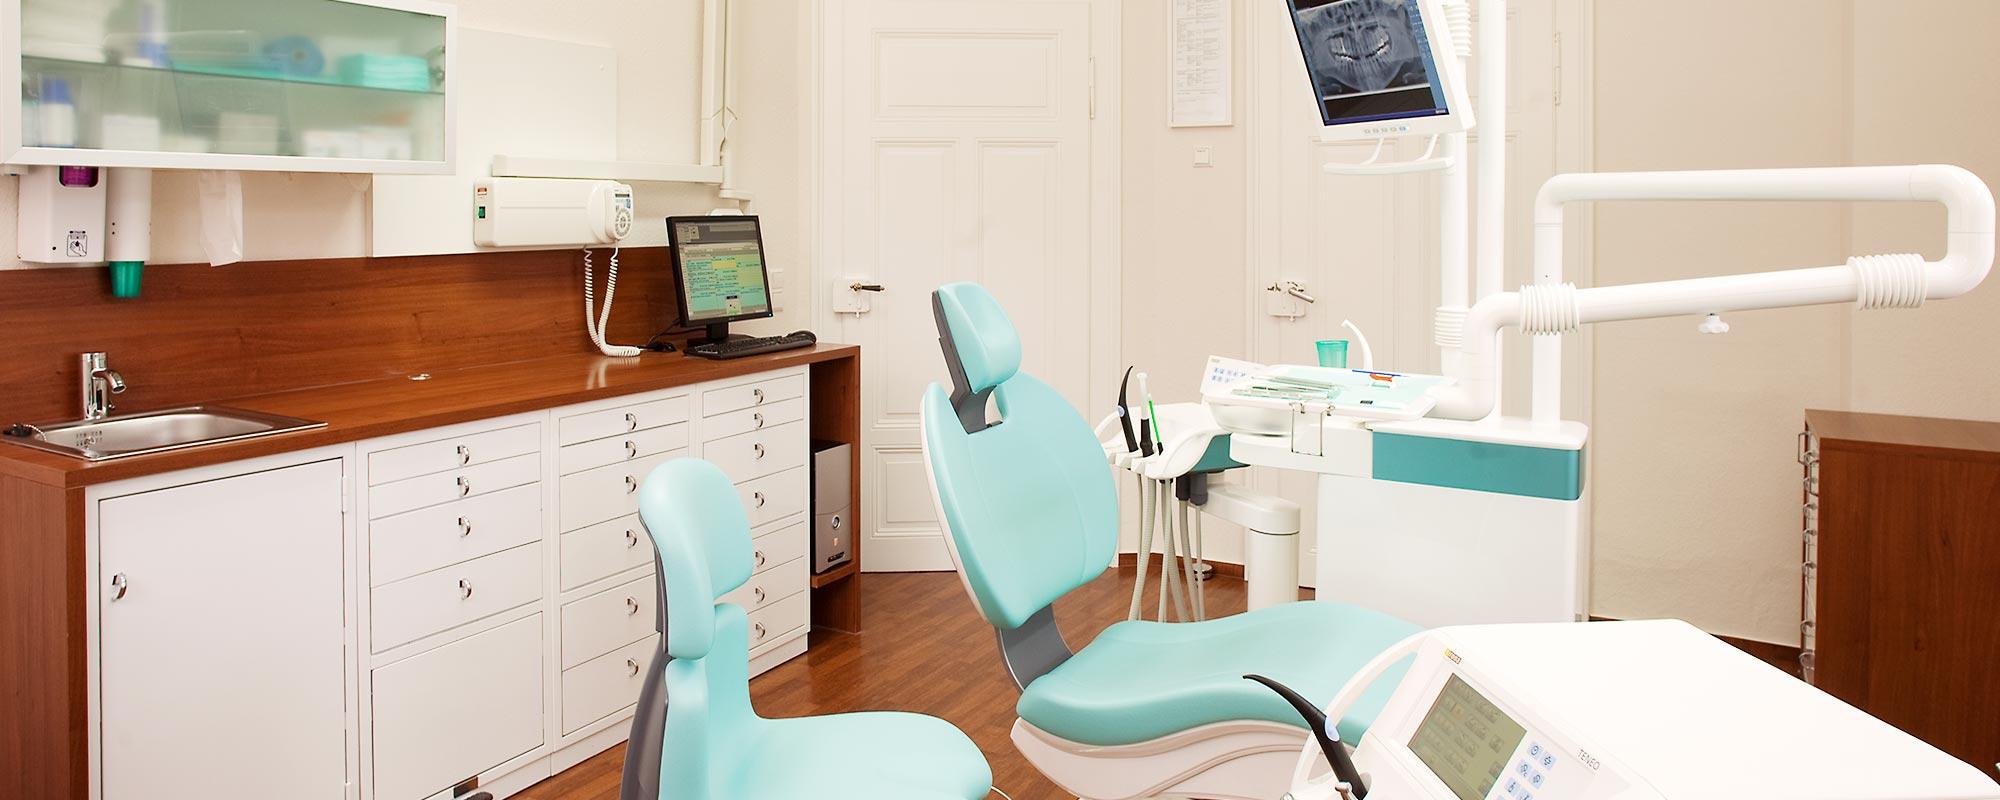 Umfassende Zahnmedizin